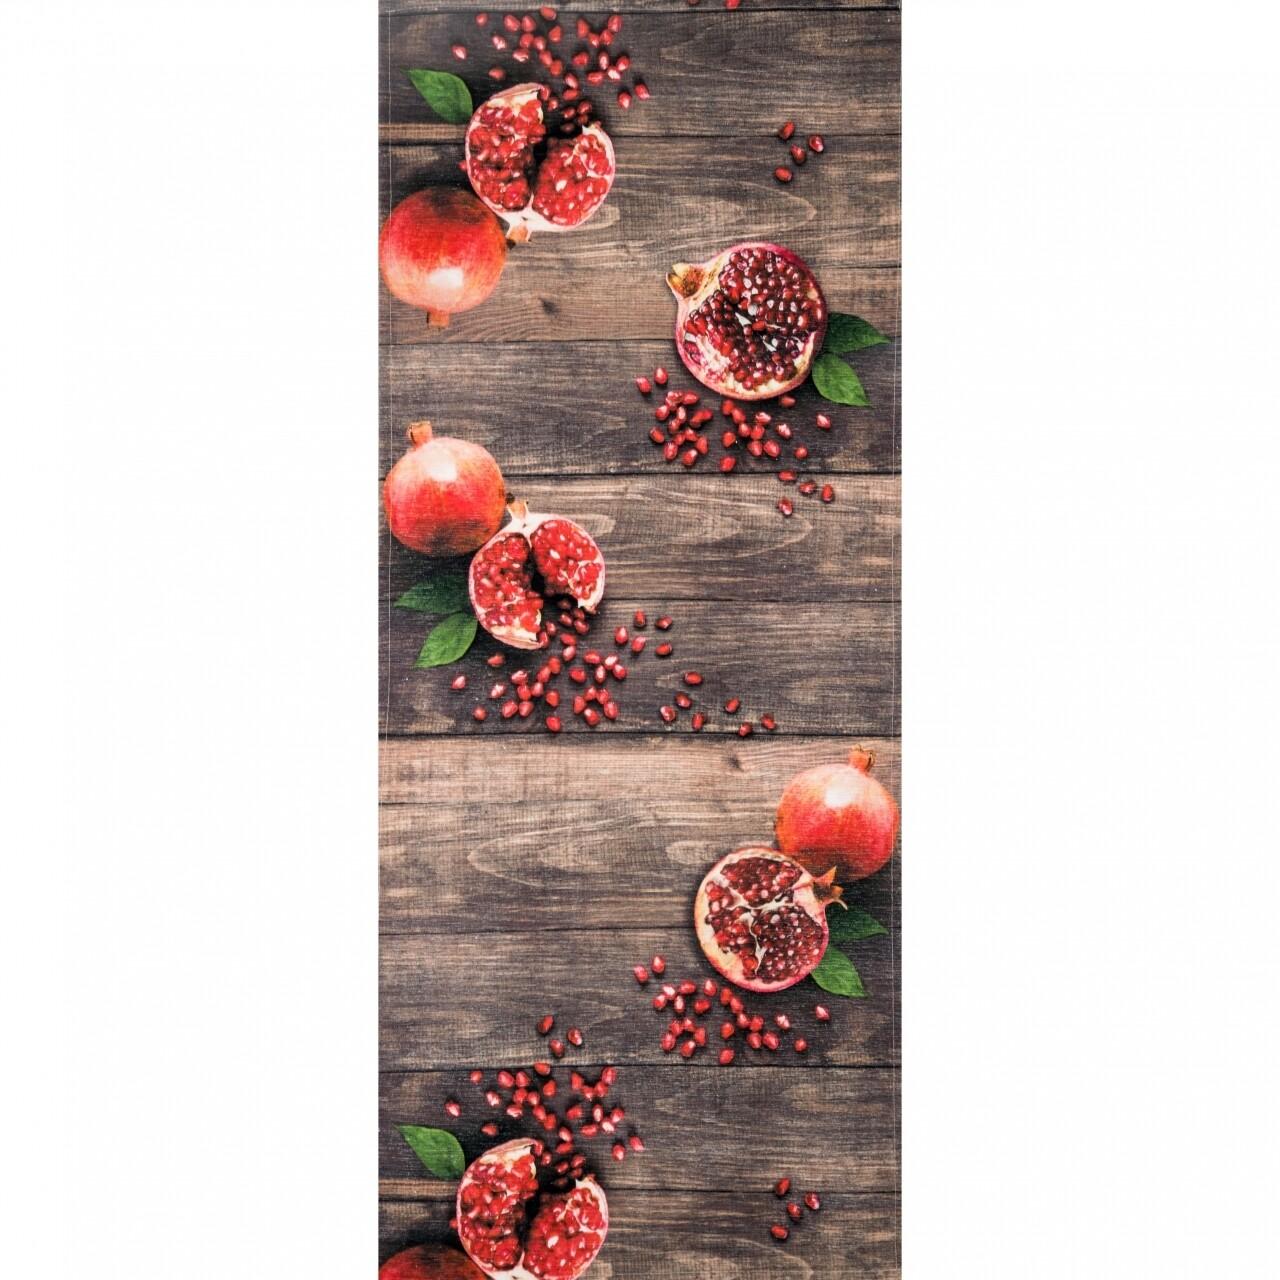 Covor rezistent Webtappeti MELOGRANA CM 58x280 cm, maro/rosu/verde